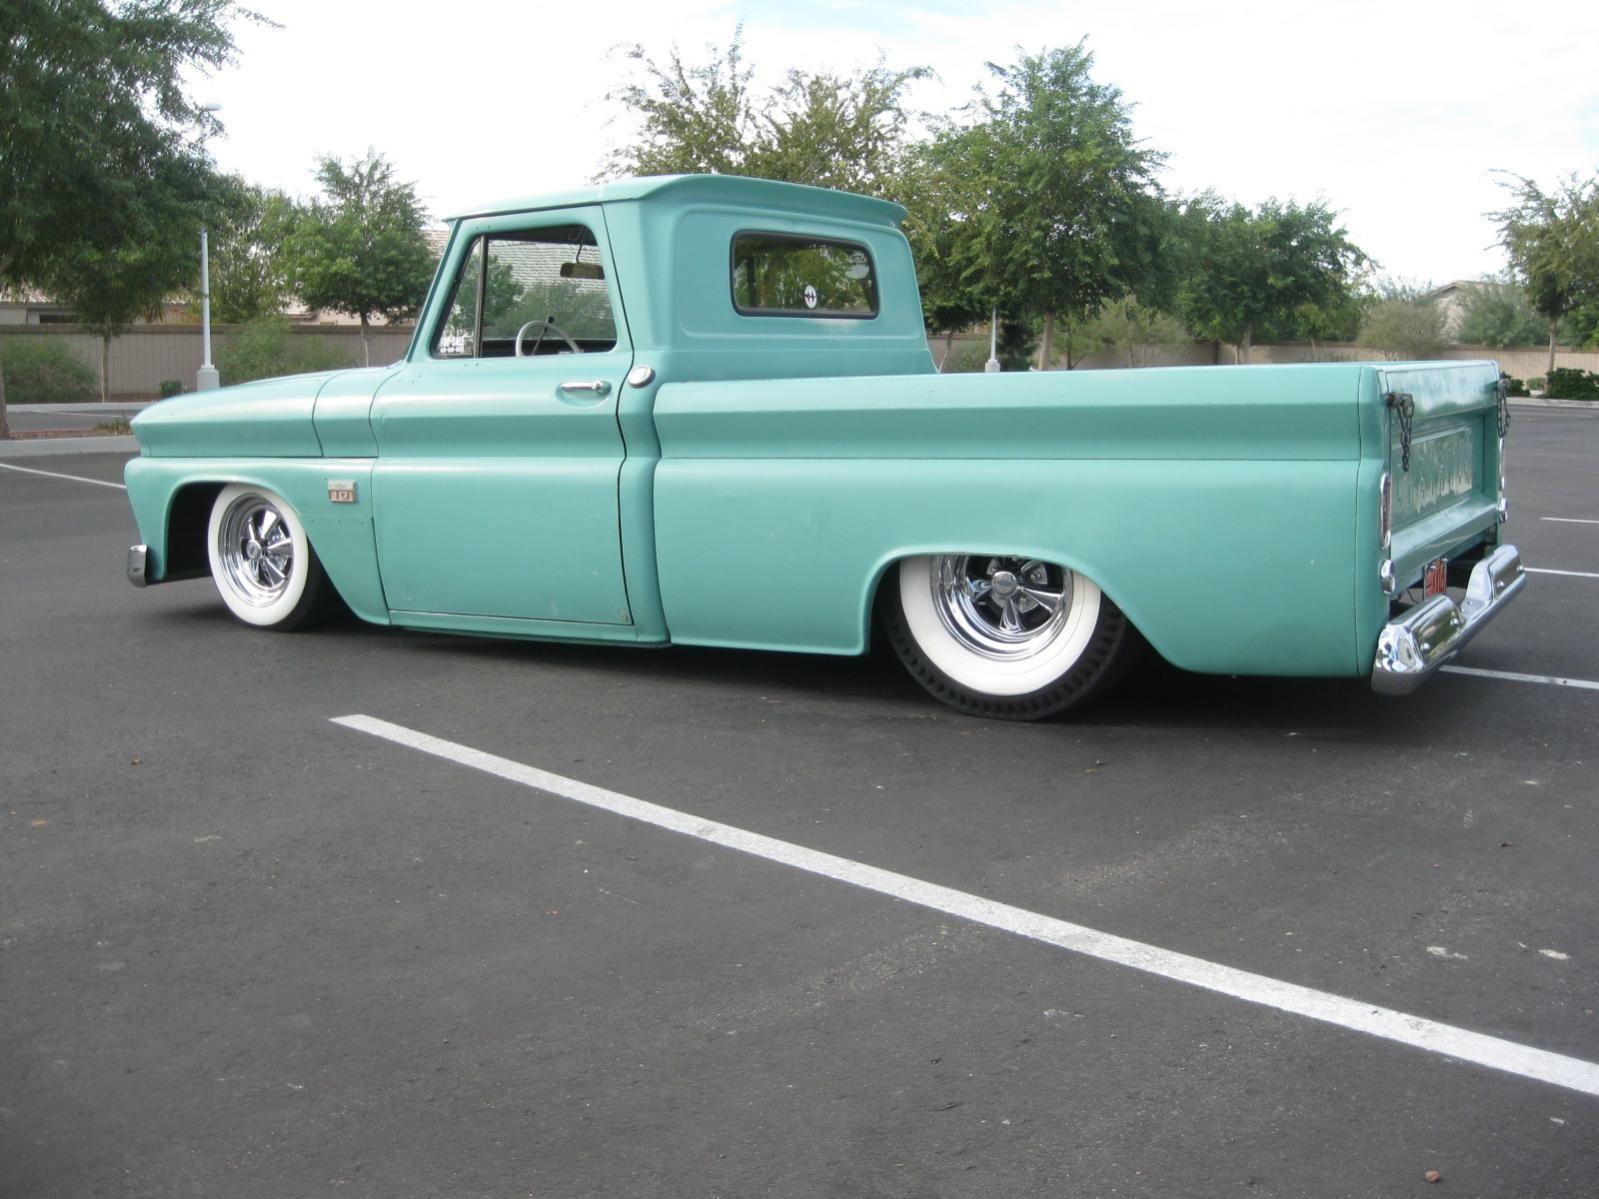 Pin by Ruffin Redwine on 65 Chevy Trucks | Pinterest | Chevrolet ...